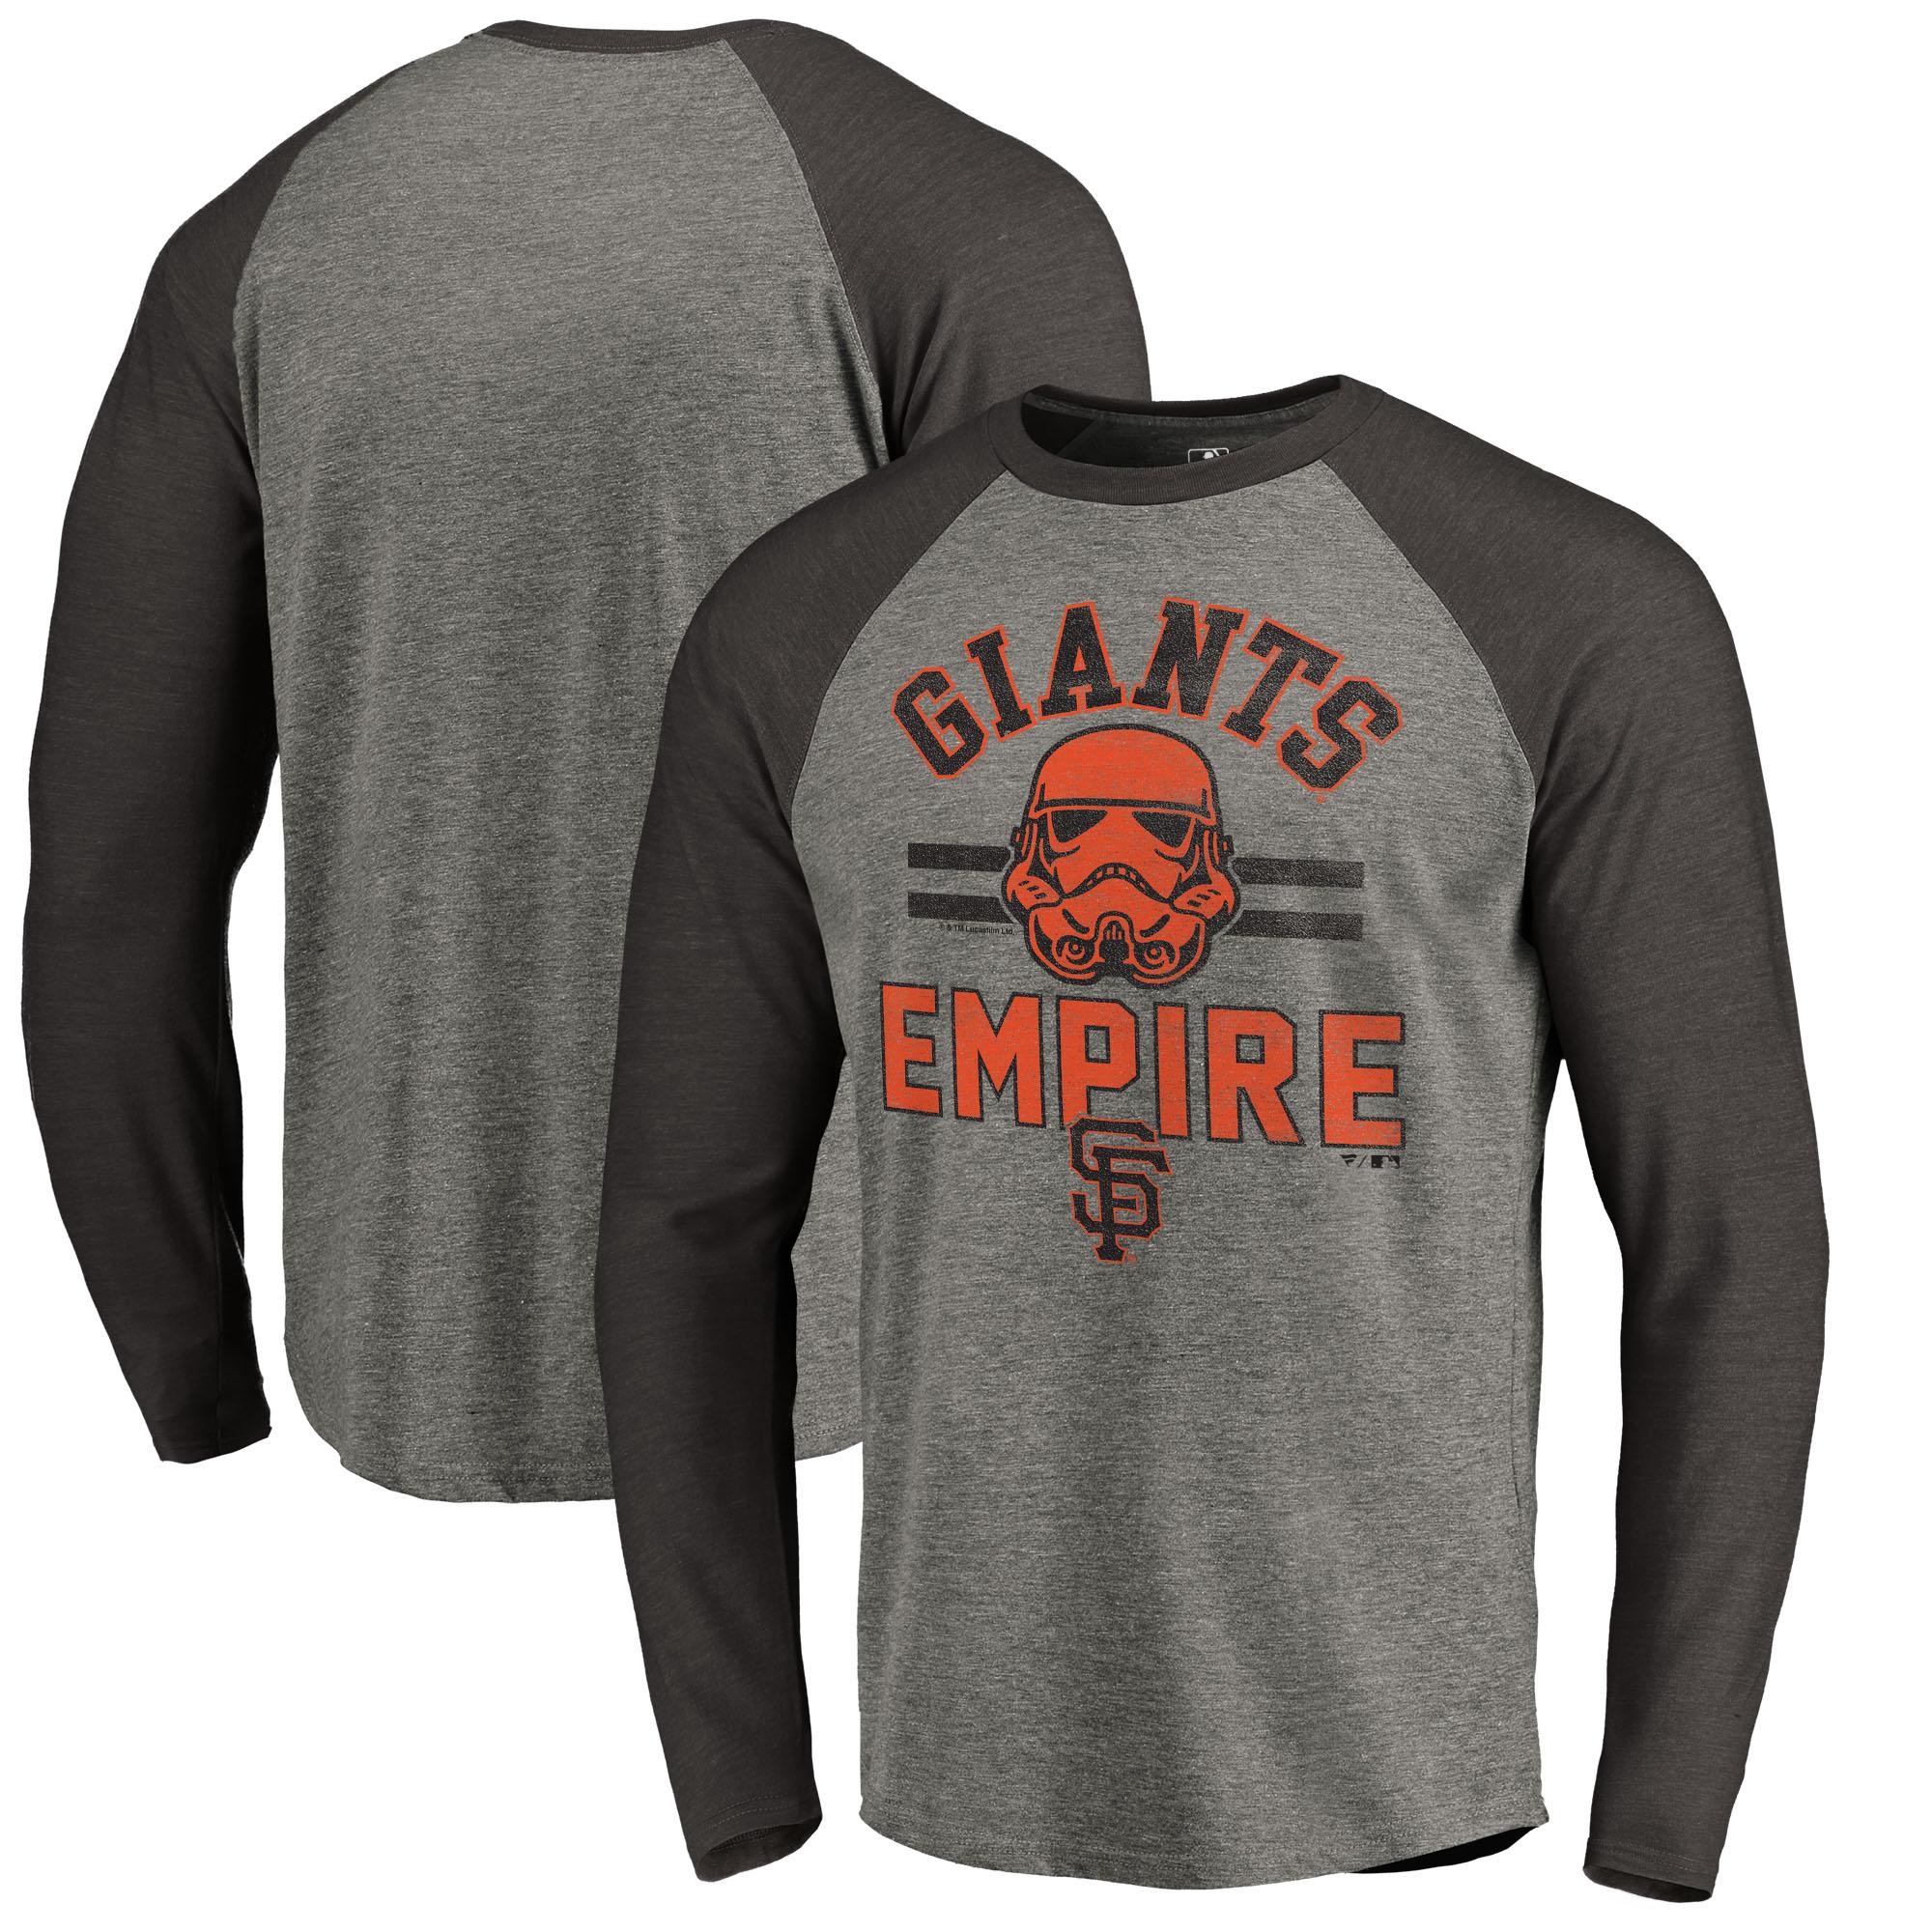 San Francisco Giants Fanatics Branded MLB Star Wars Empire Raglan Long Sleeve T-Shirt - Heather Gray